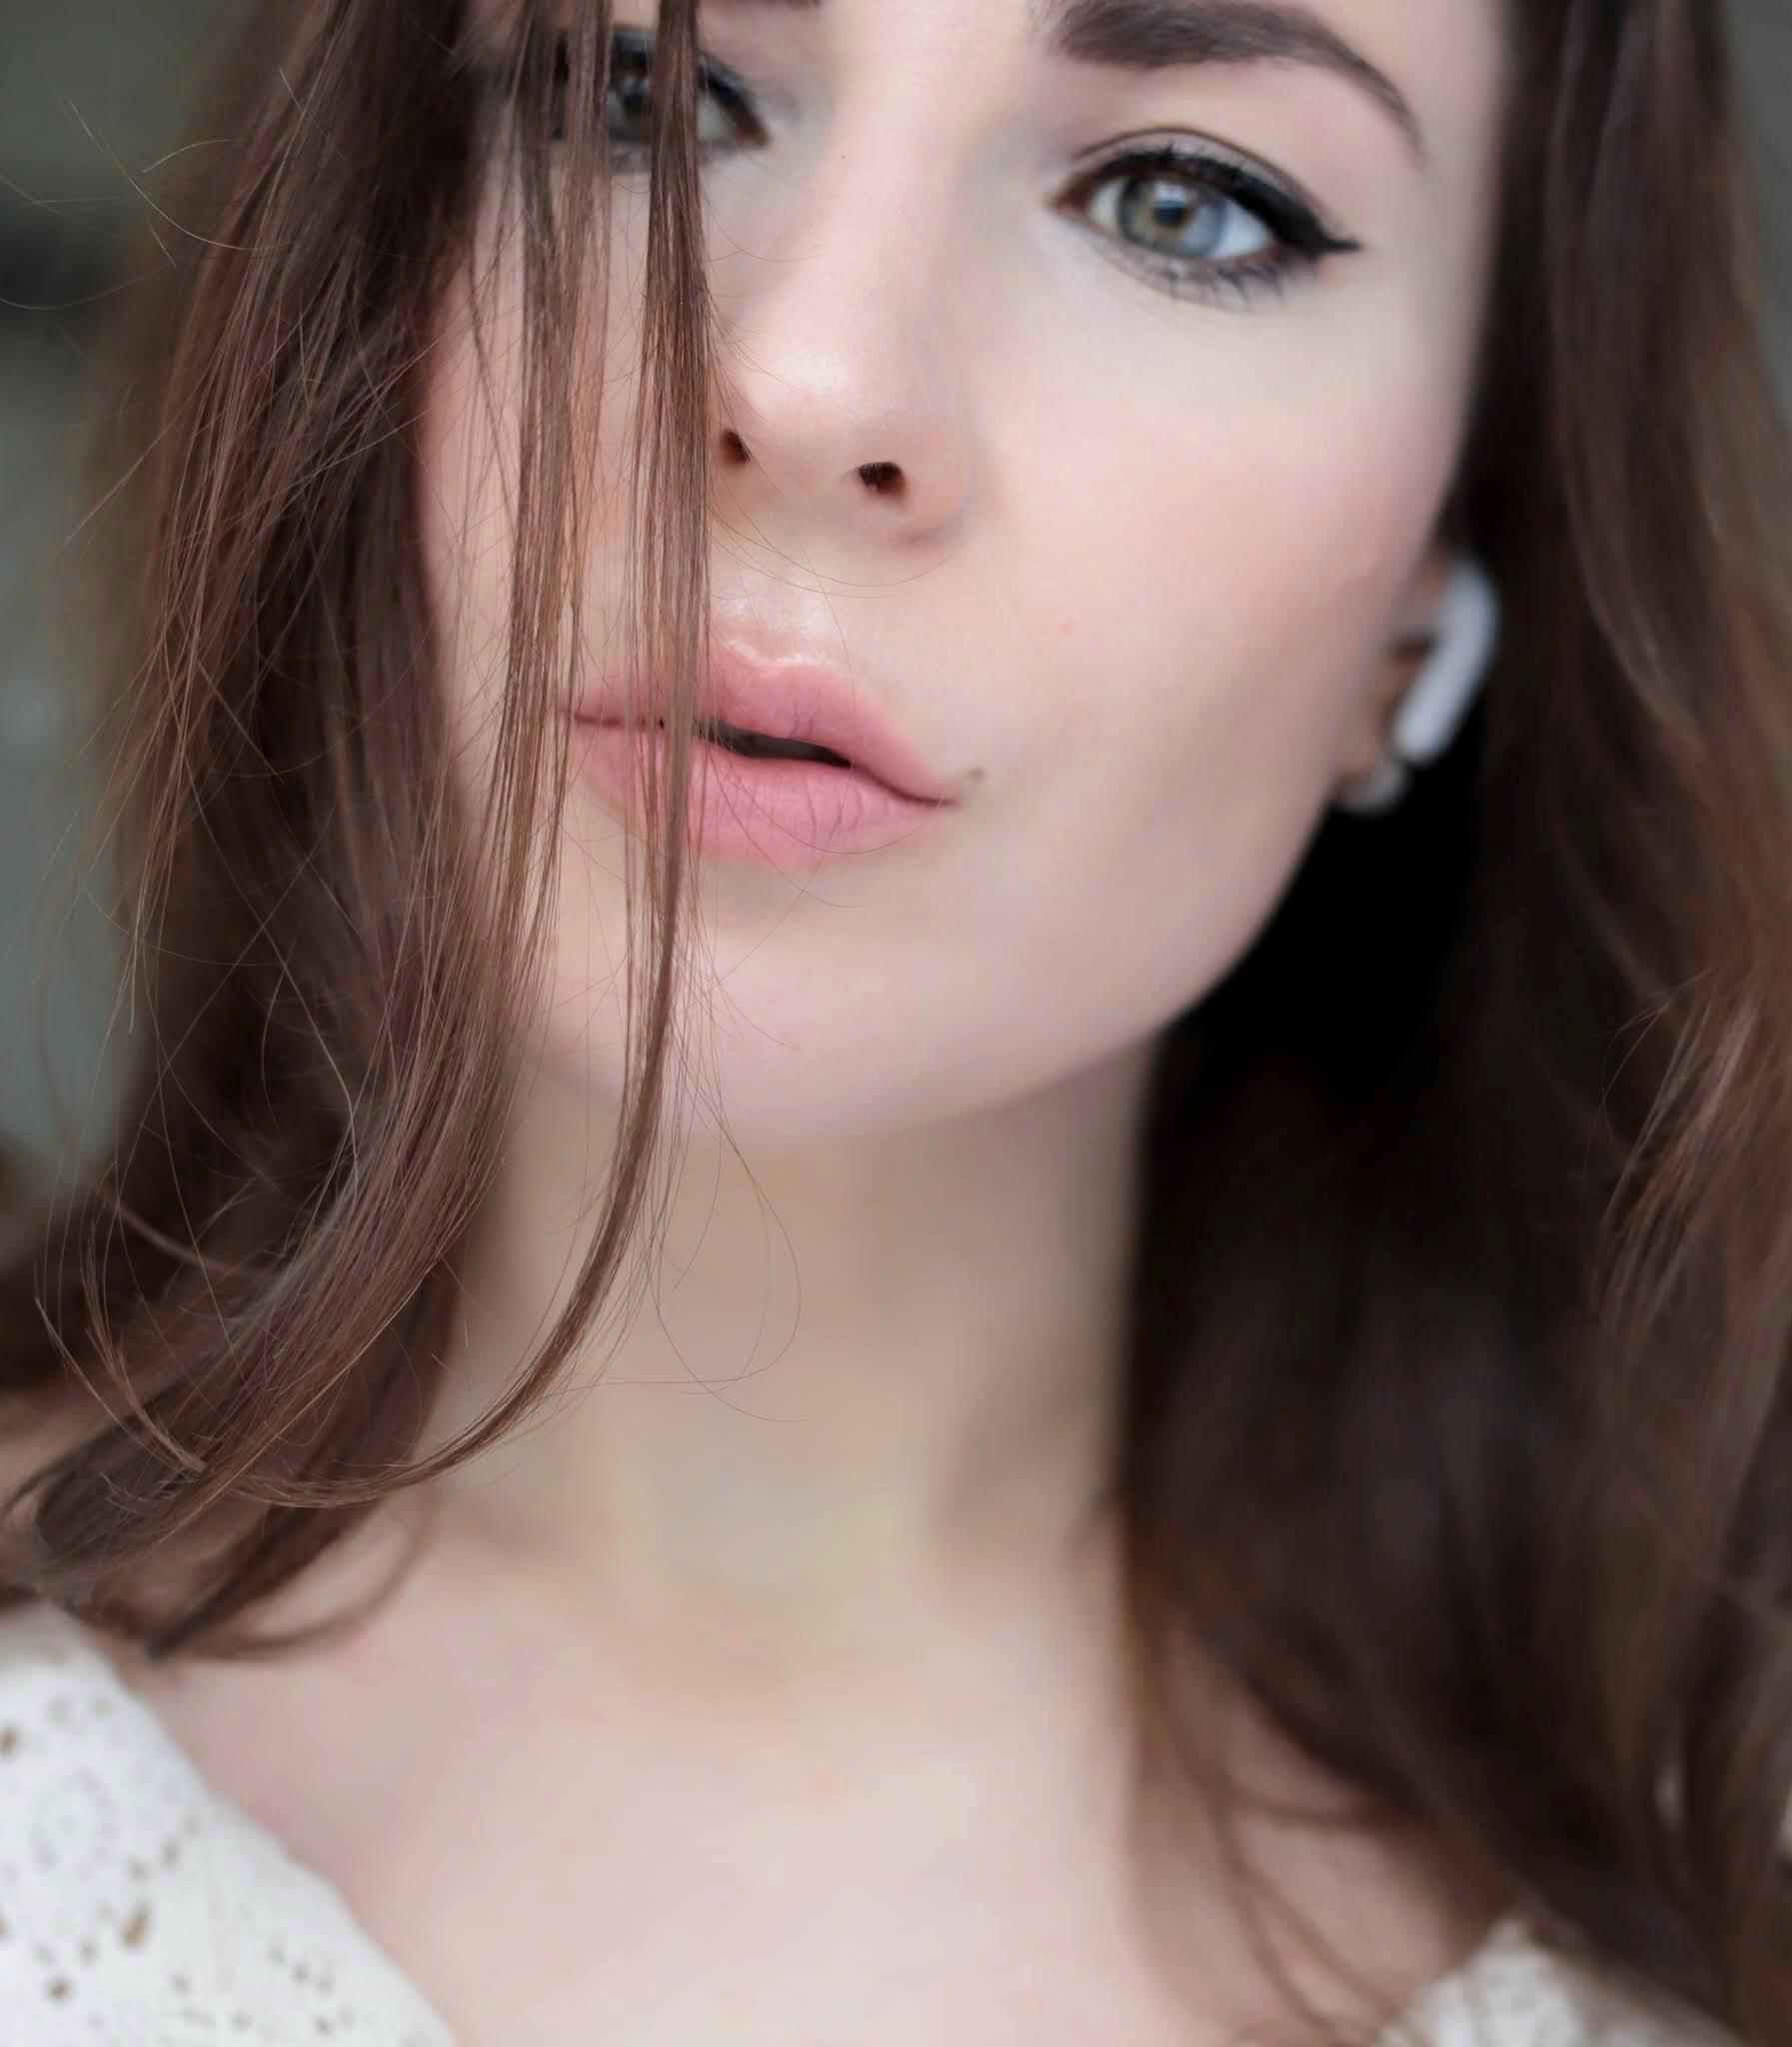 Nars Claudette Sheer Matte Lipstick Anais